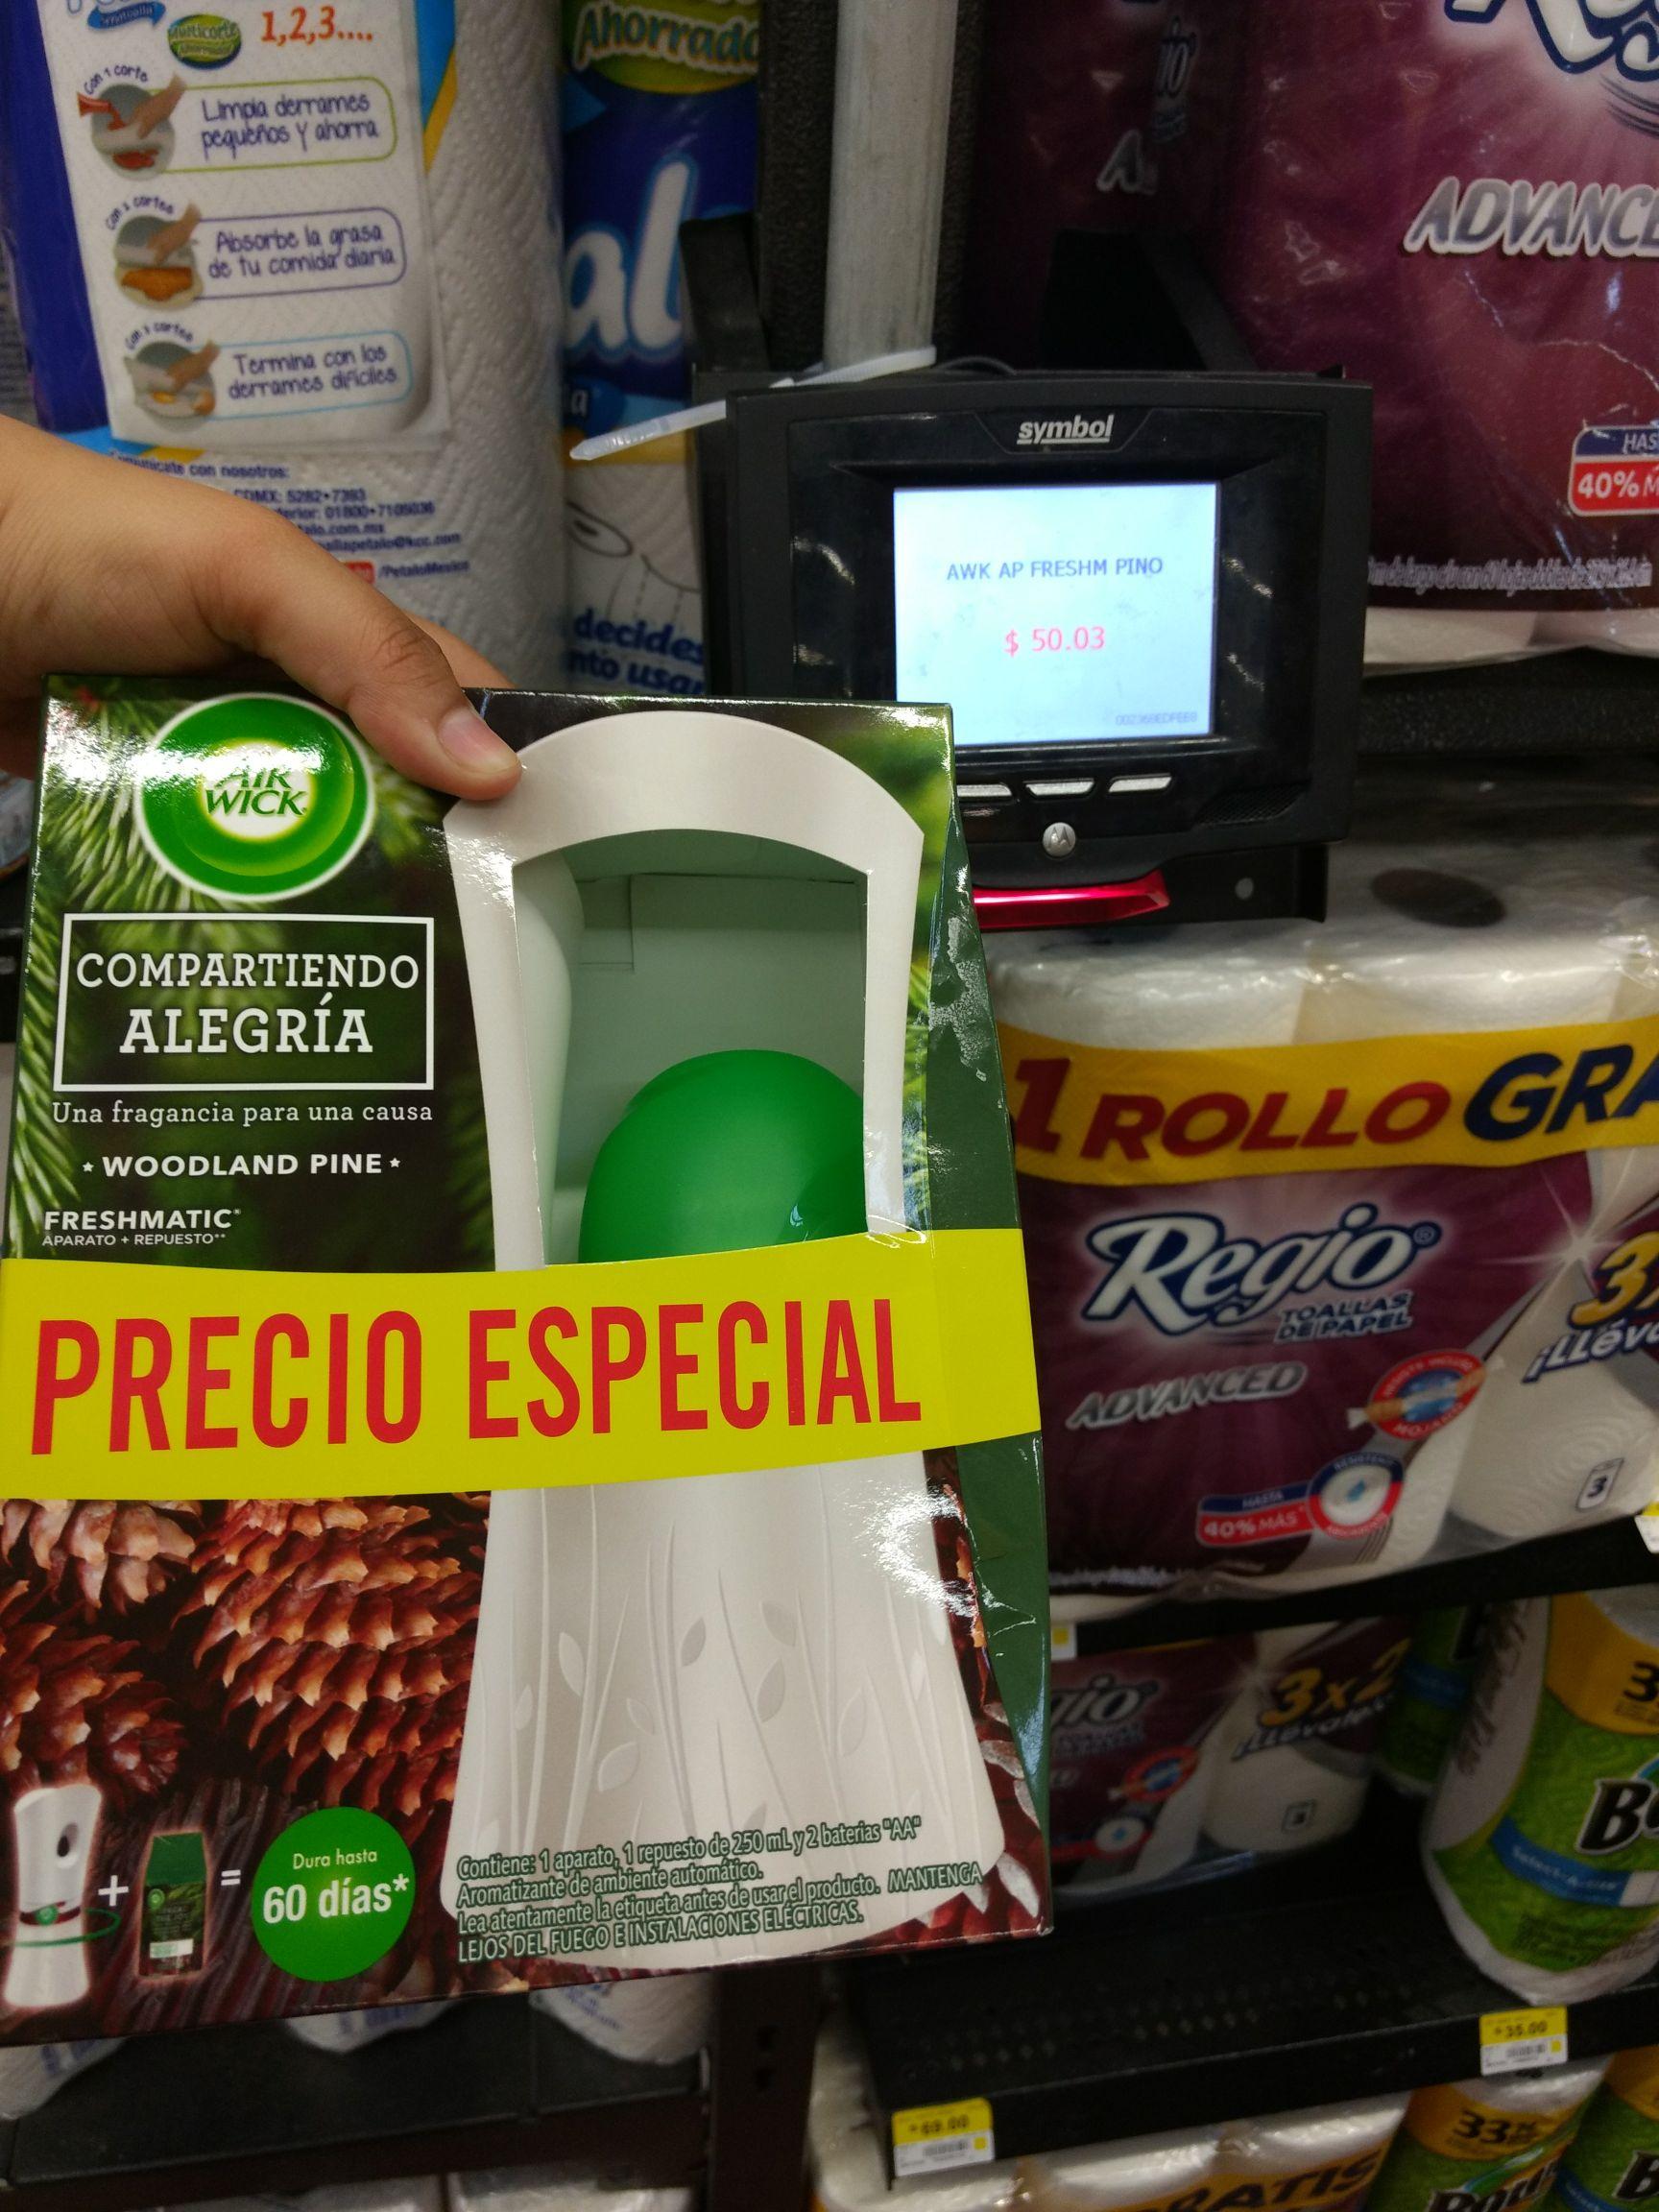 Walmart La Pastora: aromatizante automático Pino Air Wick a $50.03